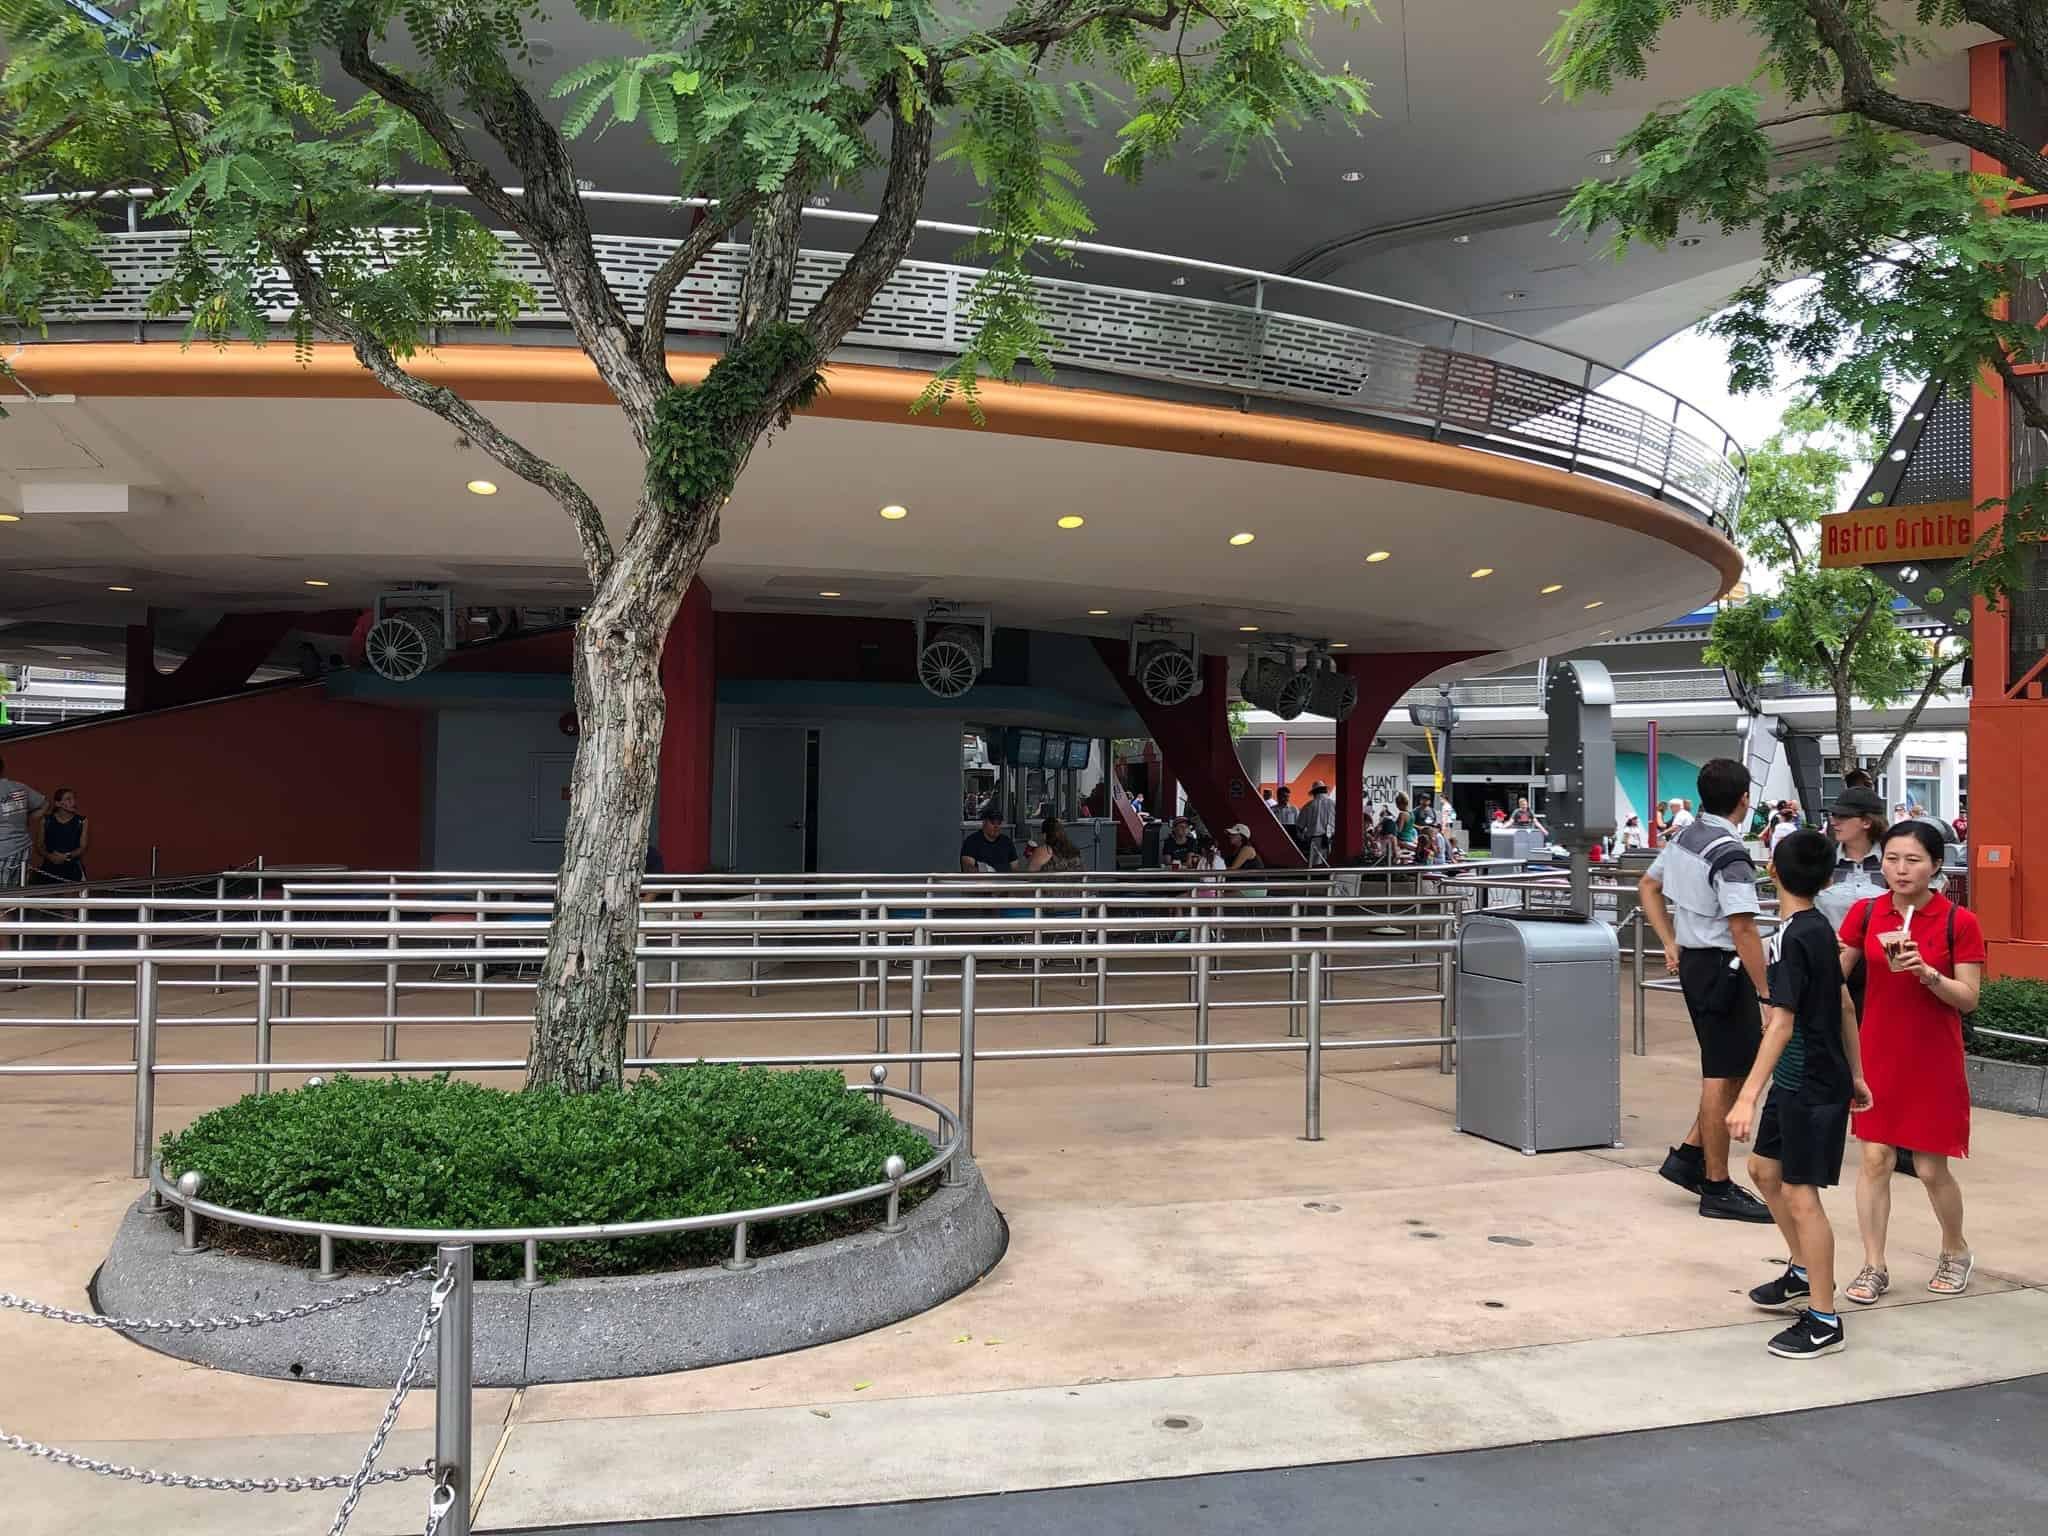 An empty Astro Orbiter queue in Tomorrowland.